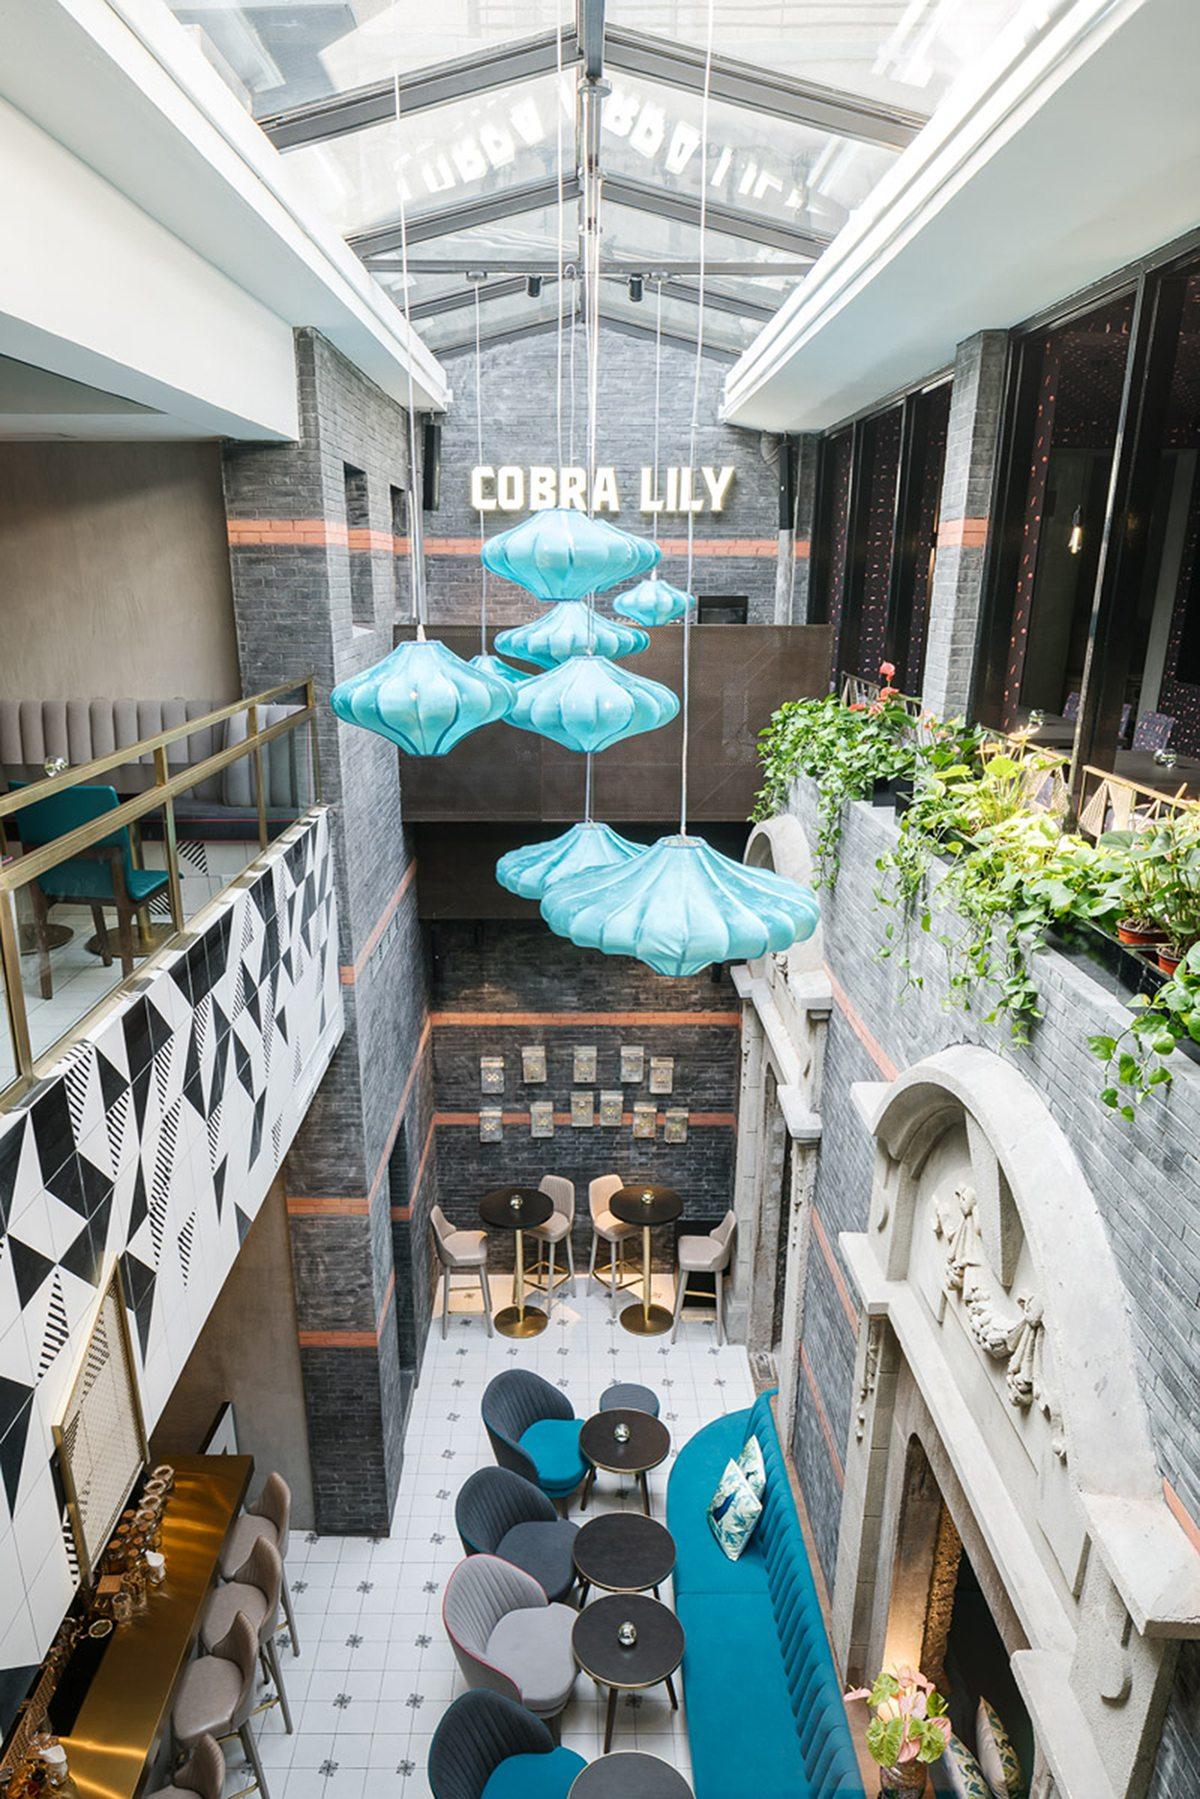 Cobra Lily Architecture Amp Interior Design By Hcreates